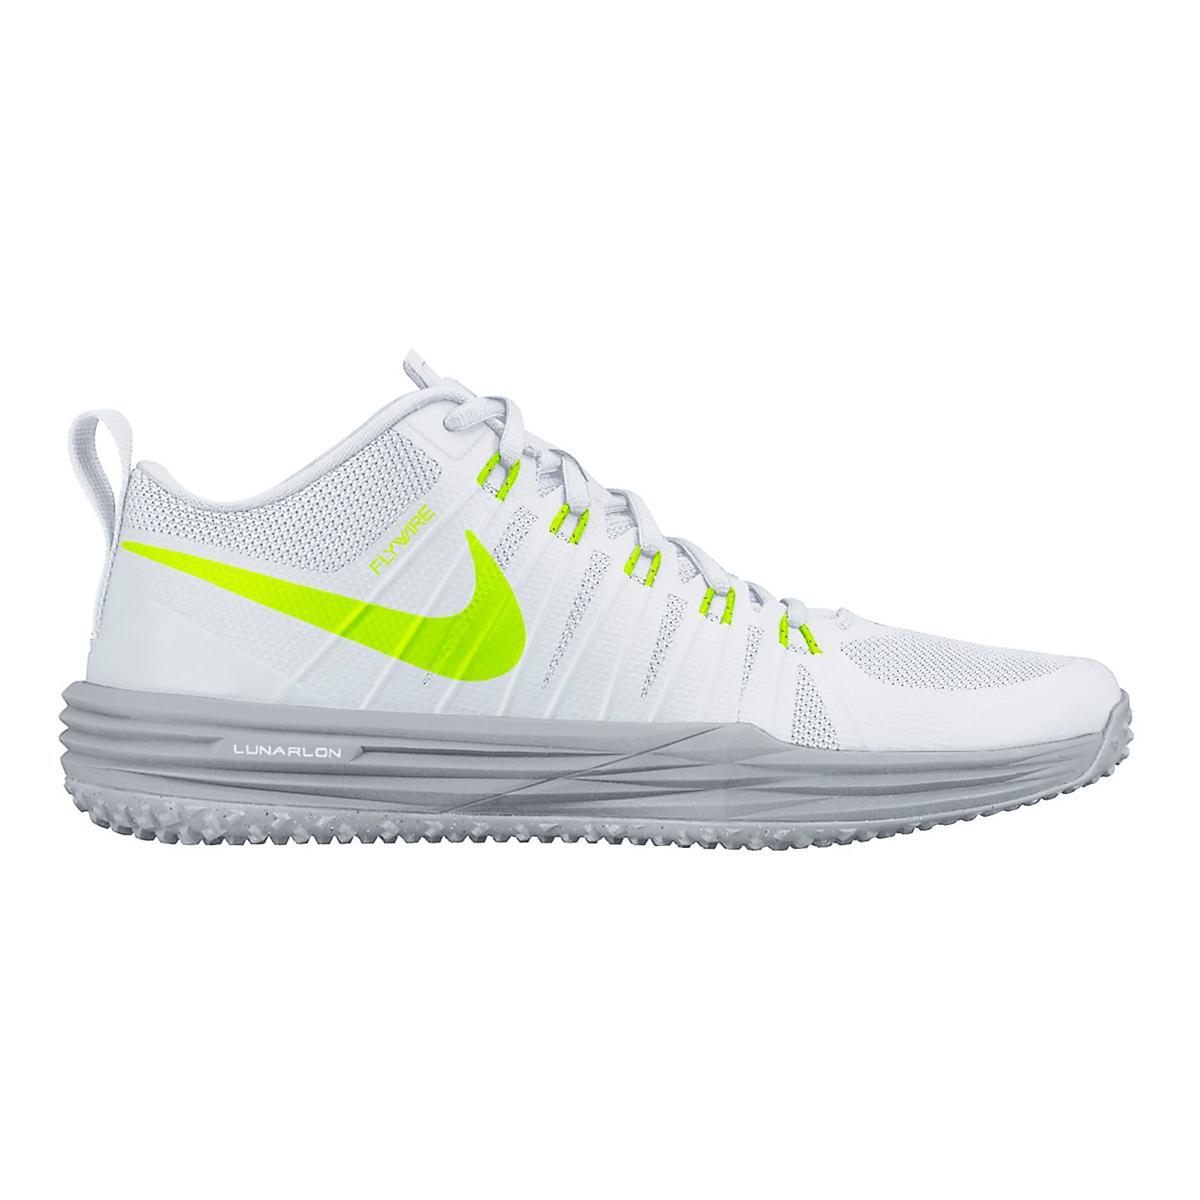 65419947c1f06 Mens Nike Lunar TR1 Cross Training Shoe at Road Runner Sports